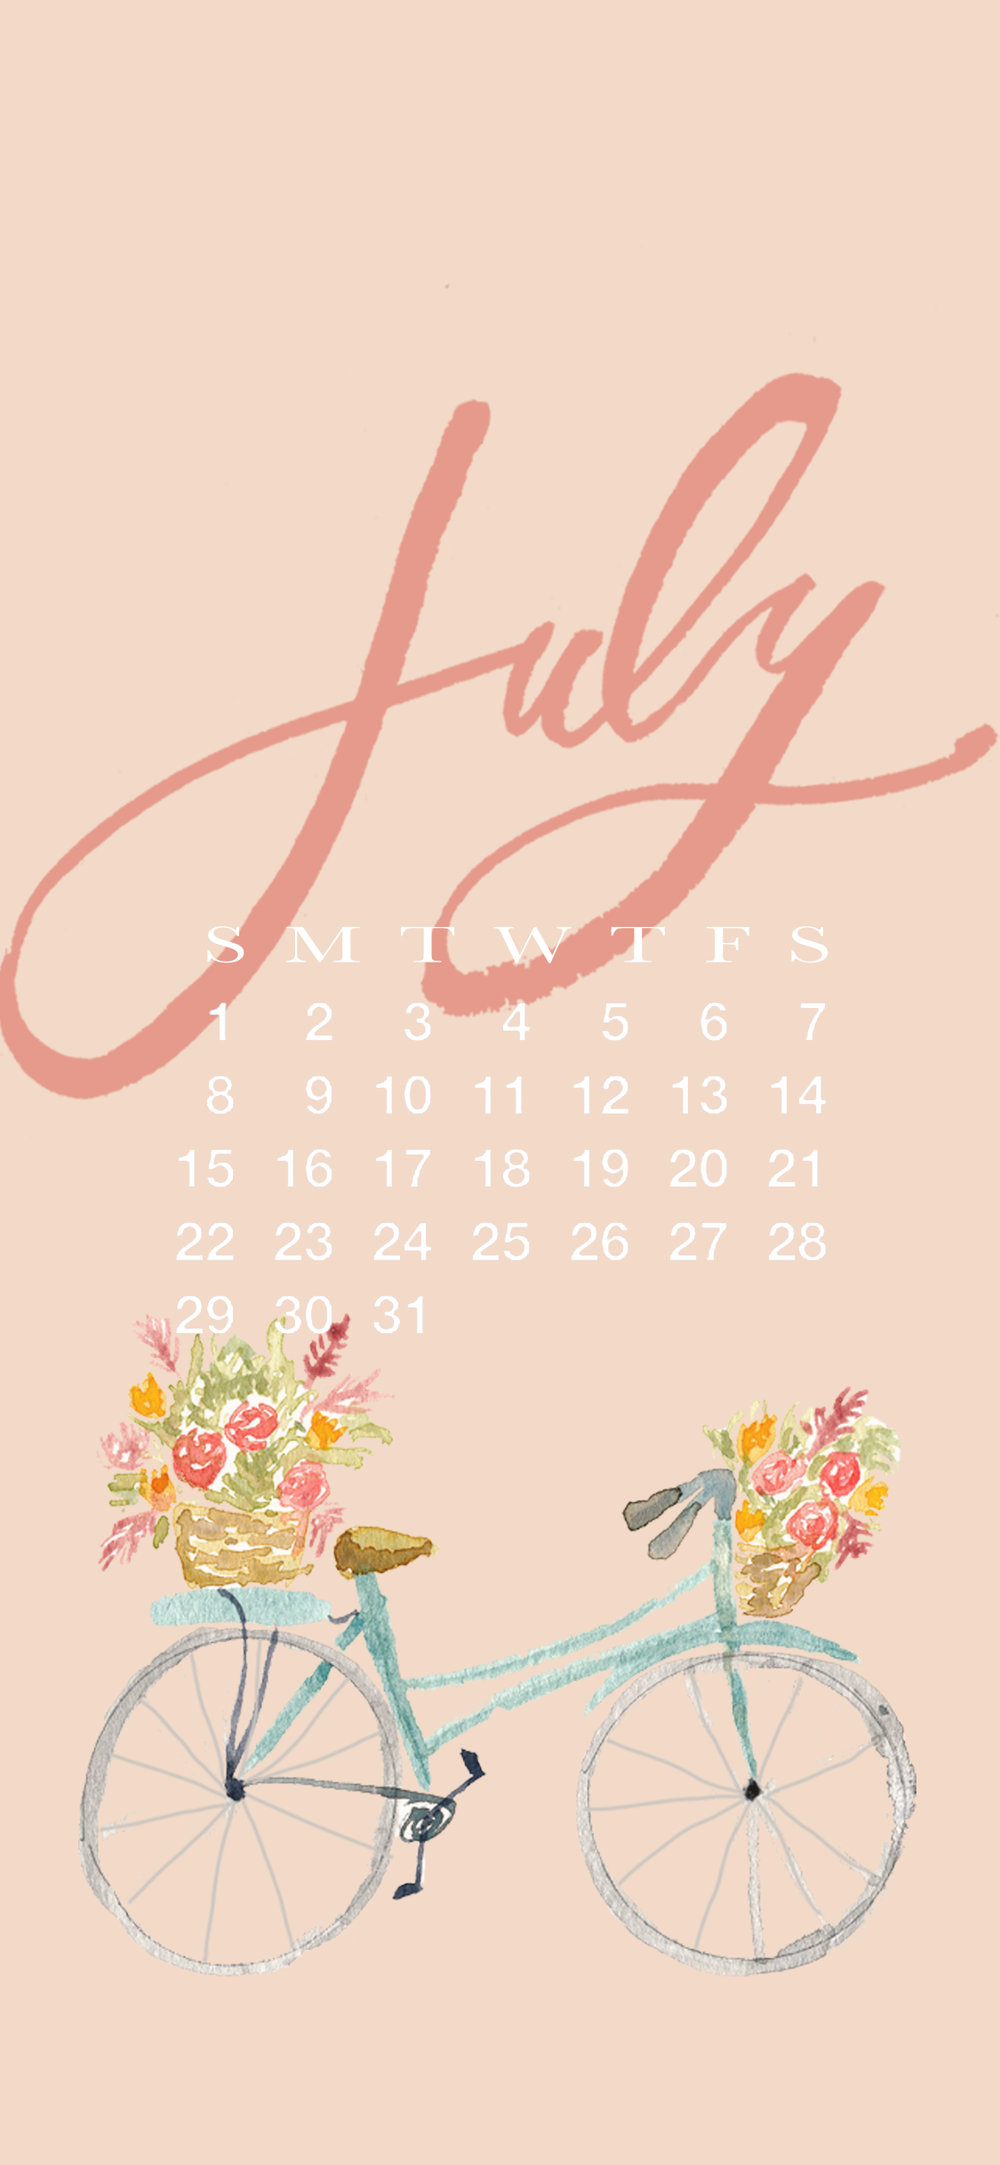 Free July 2018 Desktop And IPhone Wallpaper Calendar Lauren Antonia